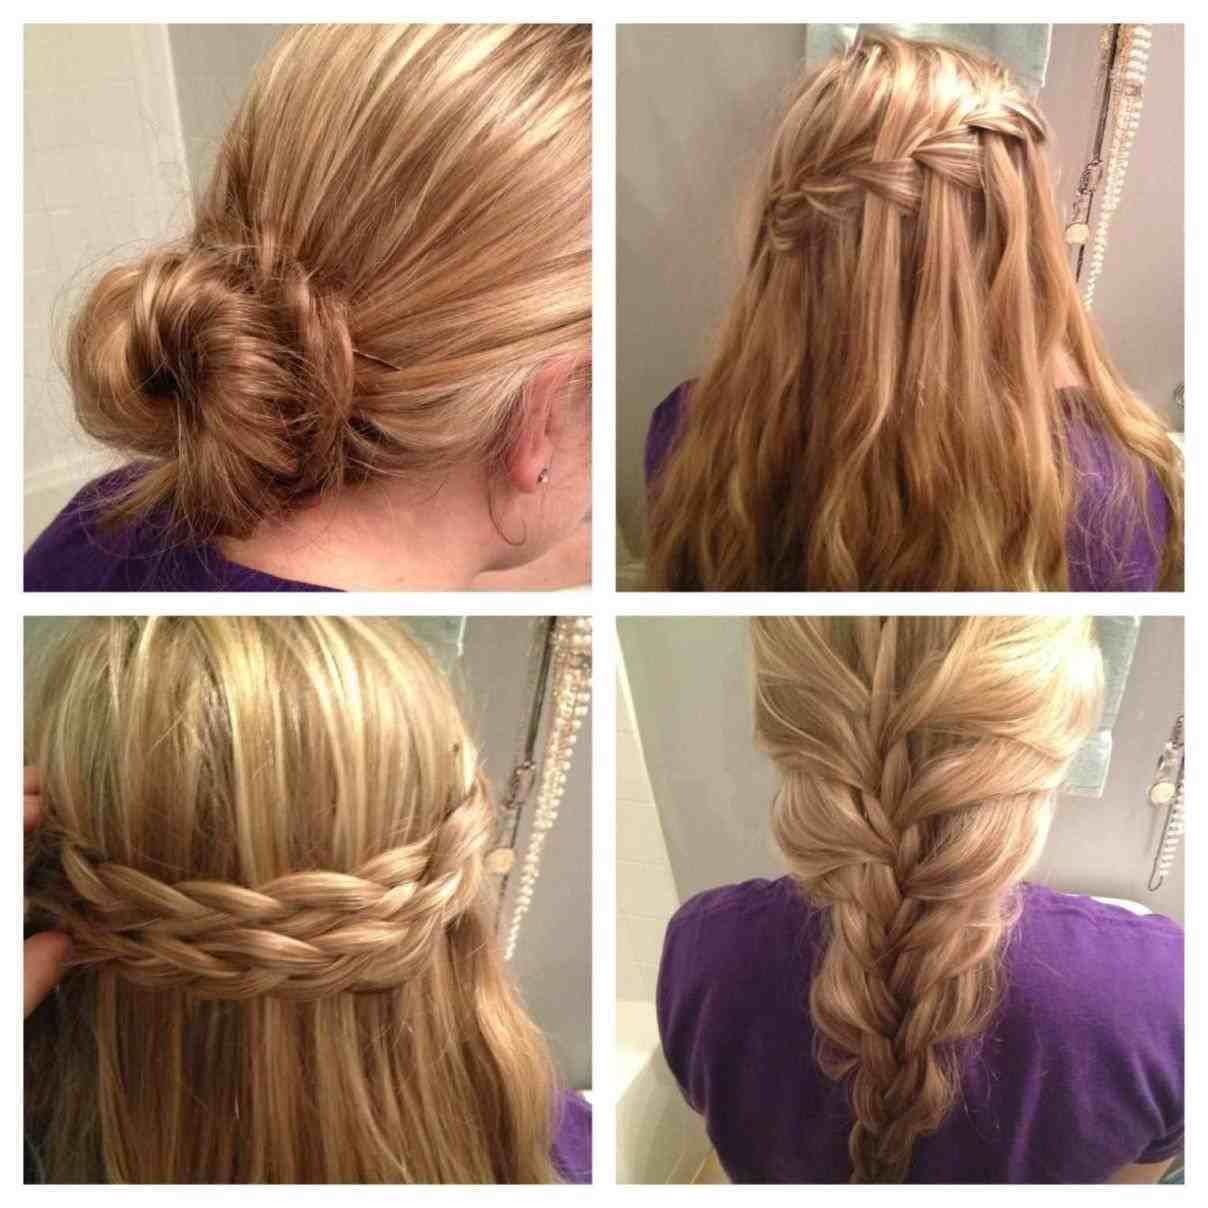 Classy half up half down pigtails mins school hair minute